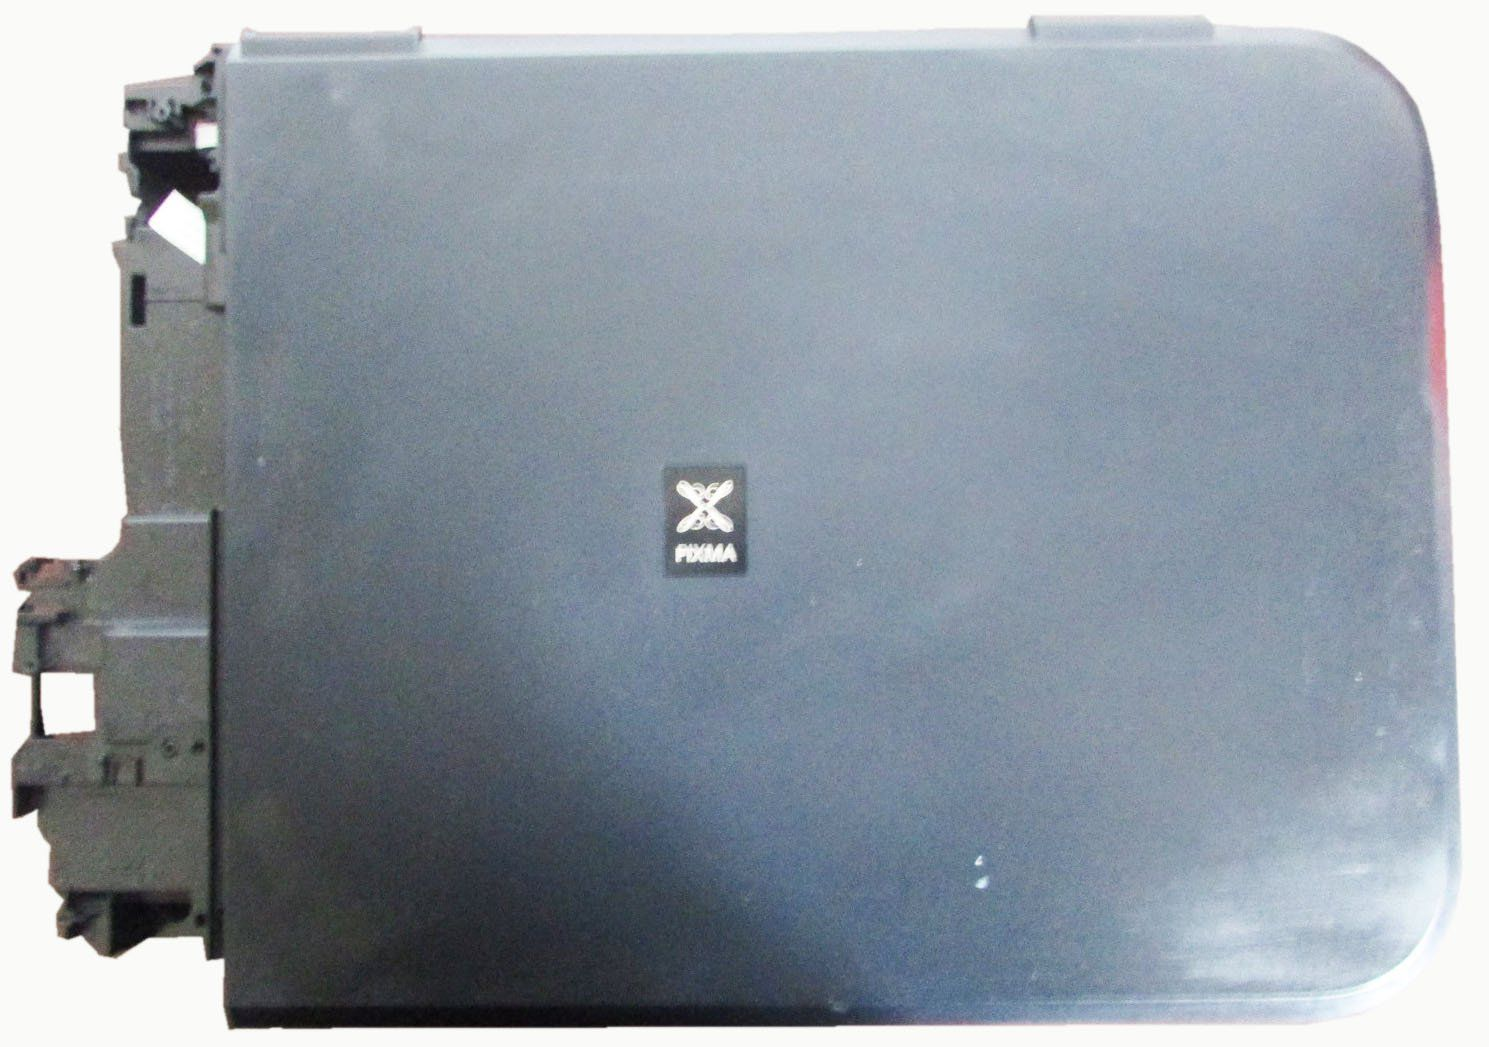 Scanner  Multifuncional Canon Pixma K10393 MG 3500 (semi novo)